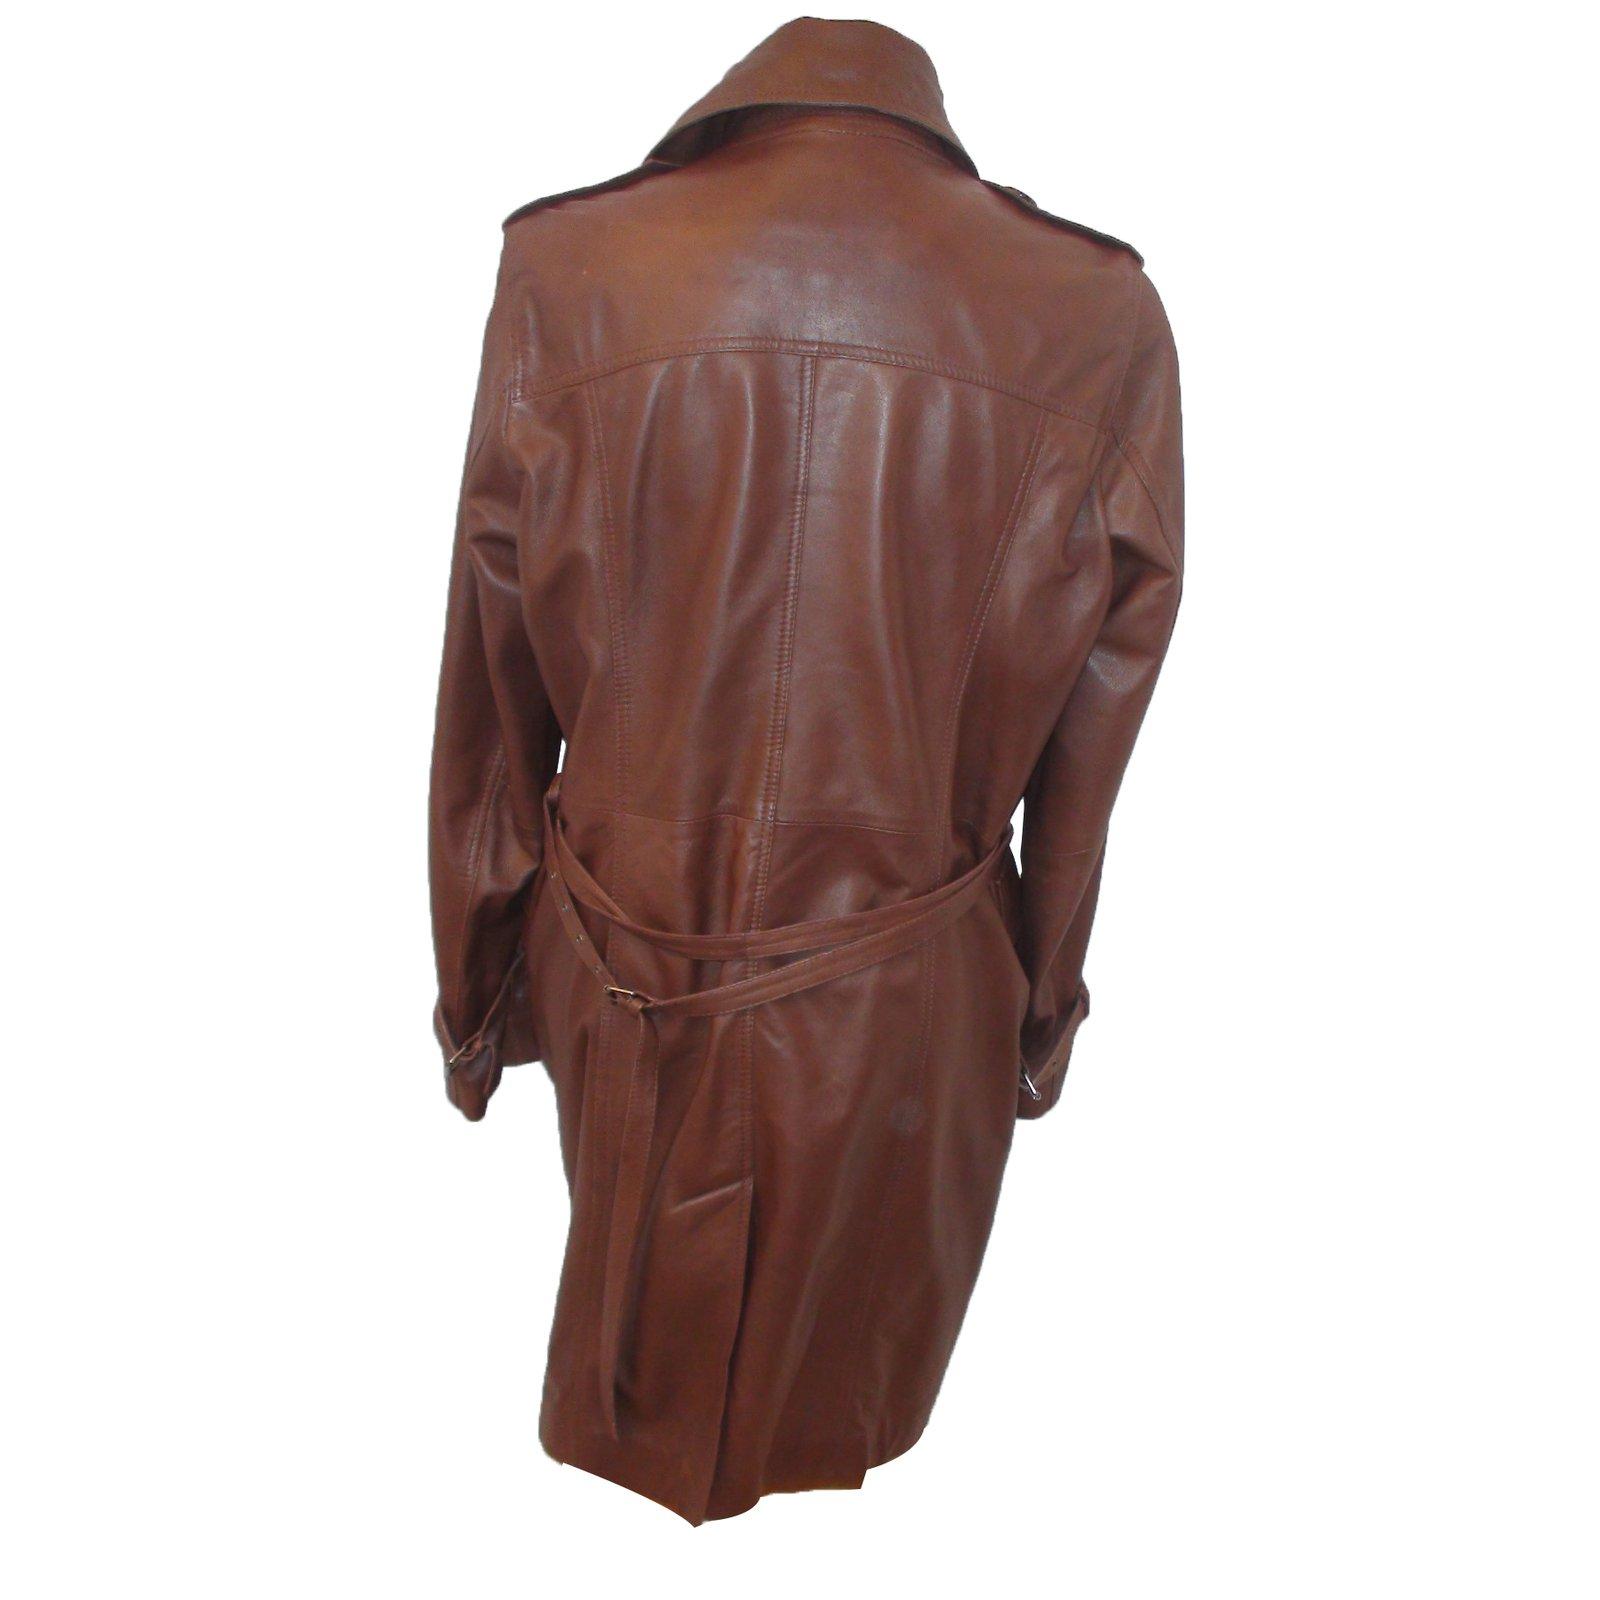 9041a7e51a016 Autre Marque  Caroll  Trench coat Trench coats Leather Brown ref.27309 -  Joli Closet